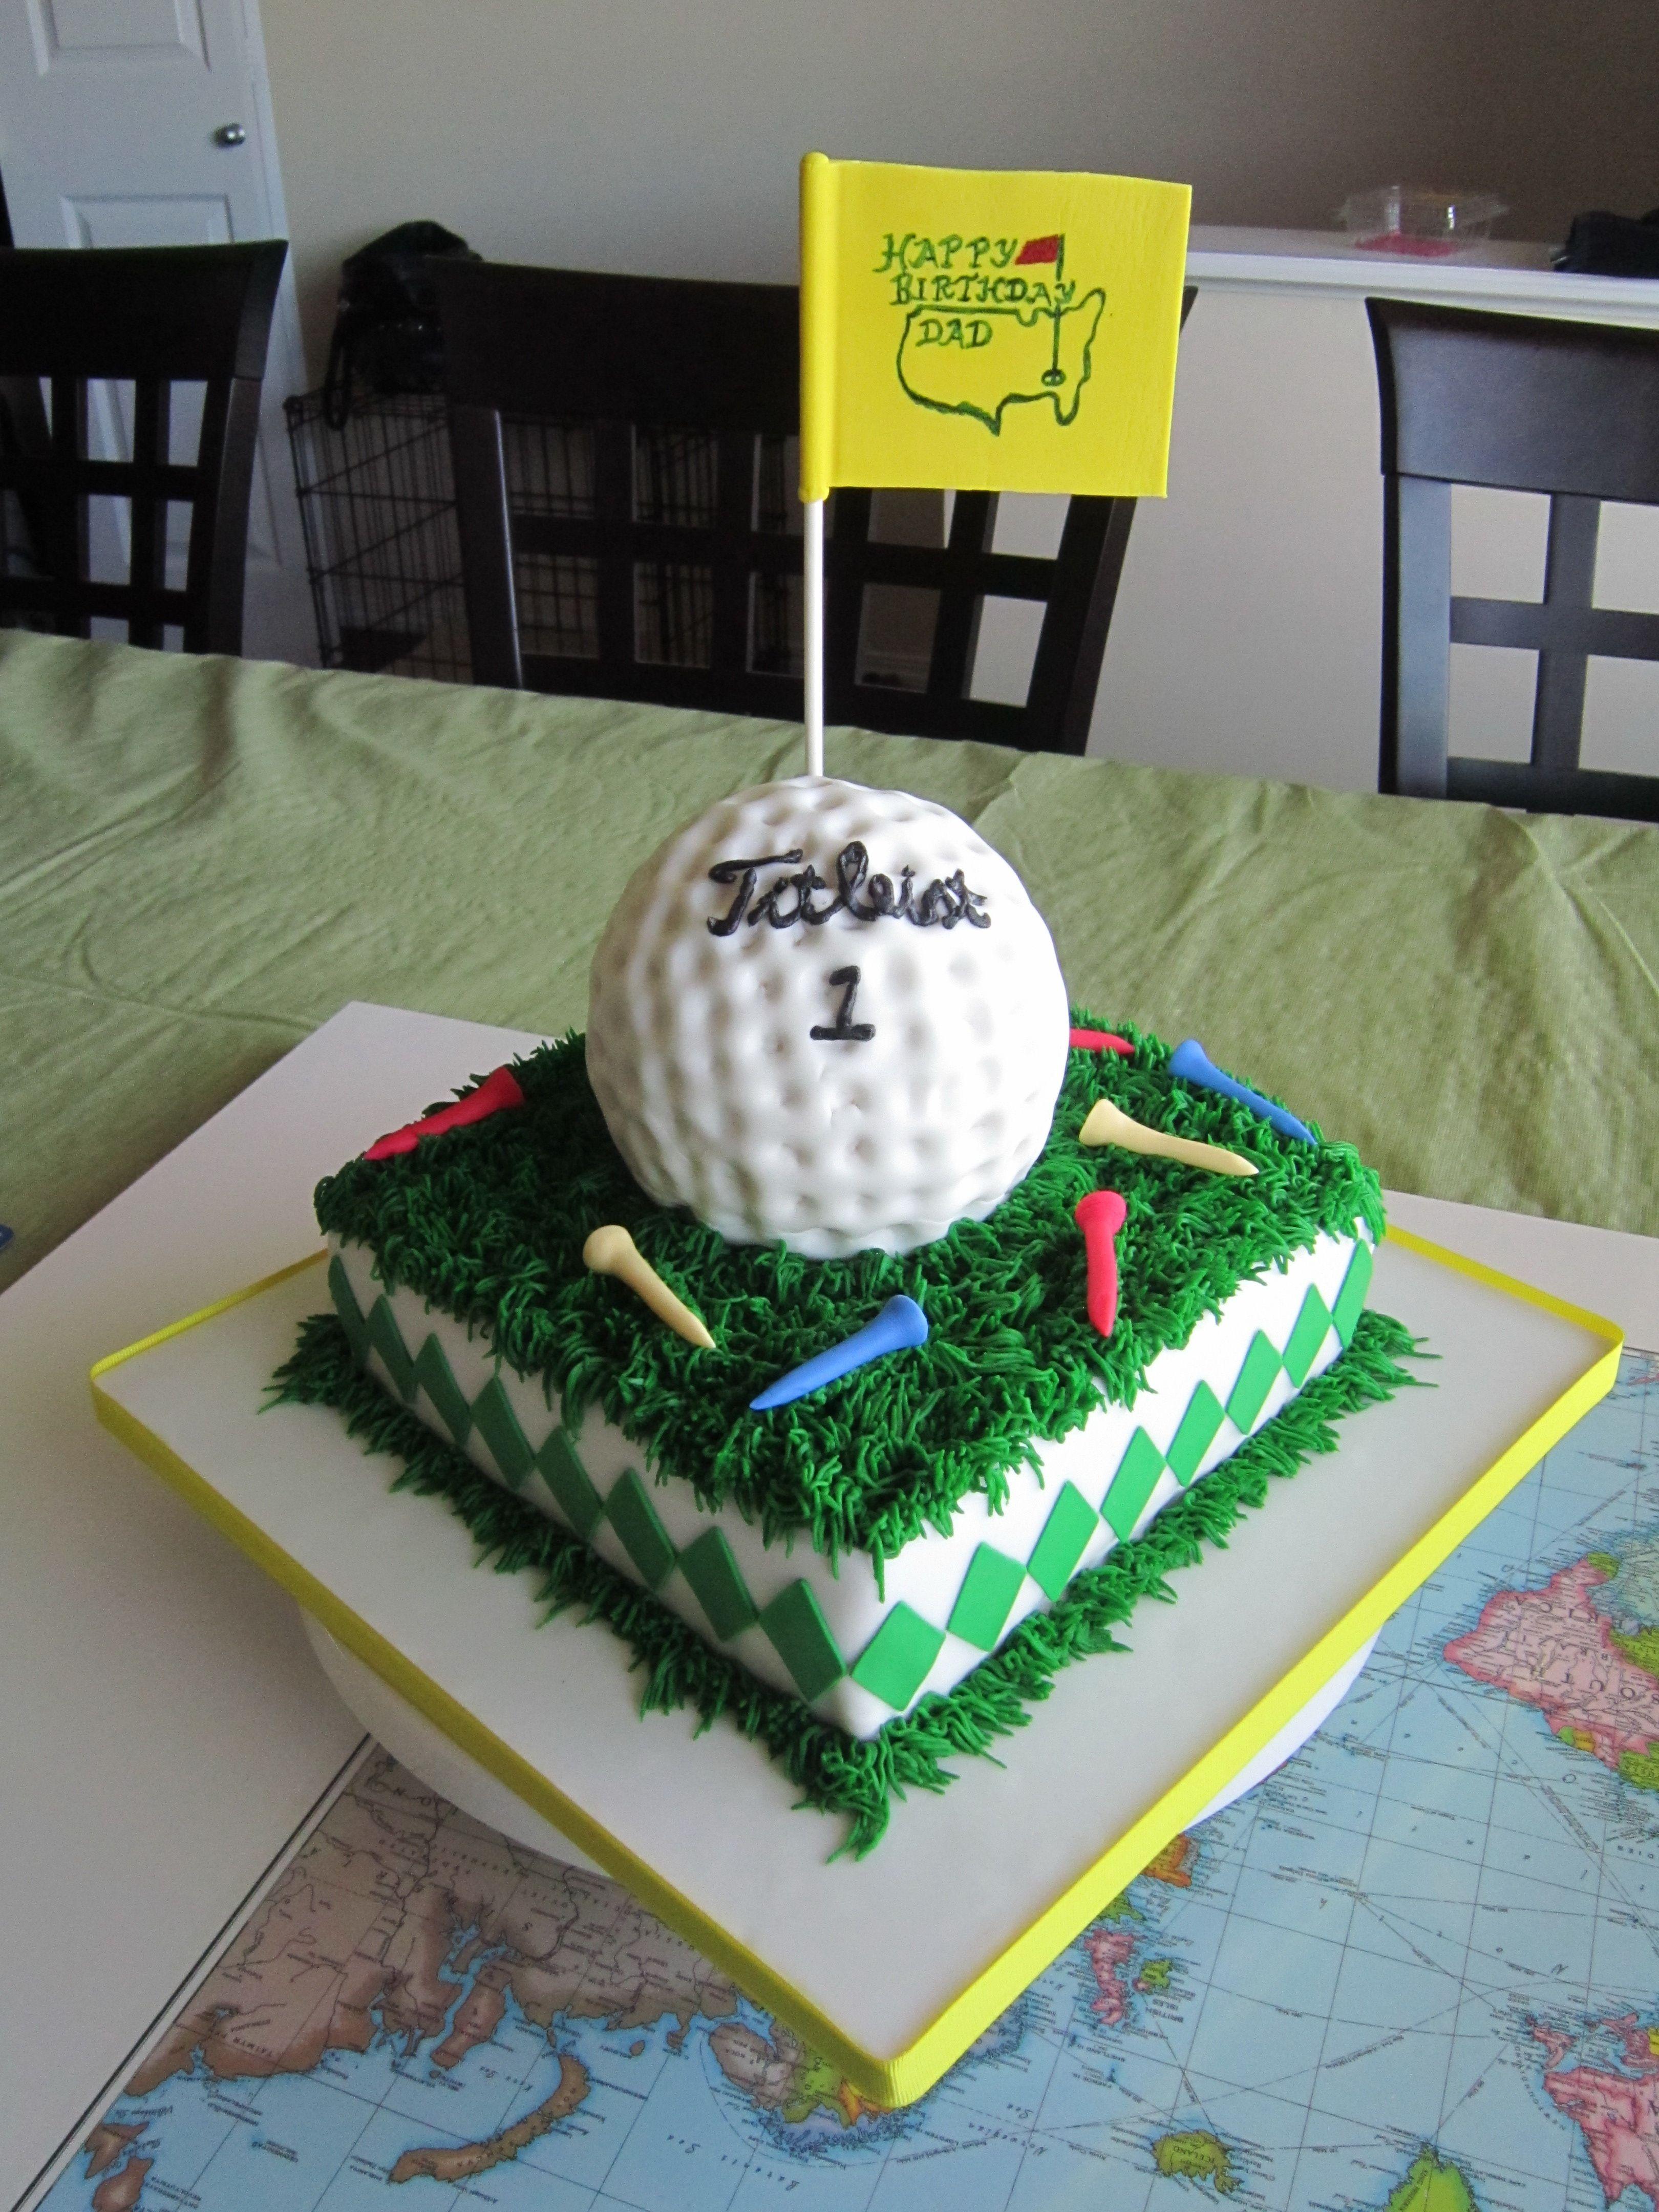 Groovy Golf Ball Augusta Pin Flag Cake With Golf Tees Golf Birthday Personalised Birthday Cards Arneslily Jamesorg